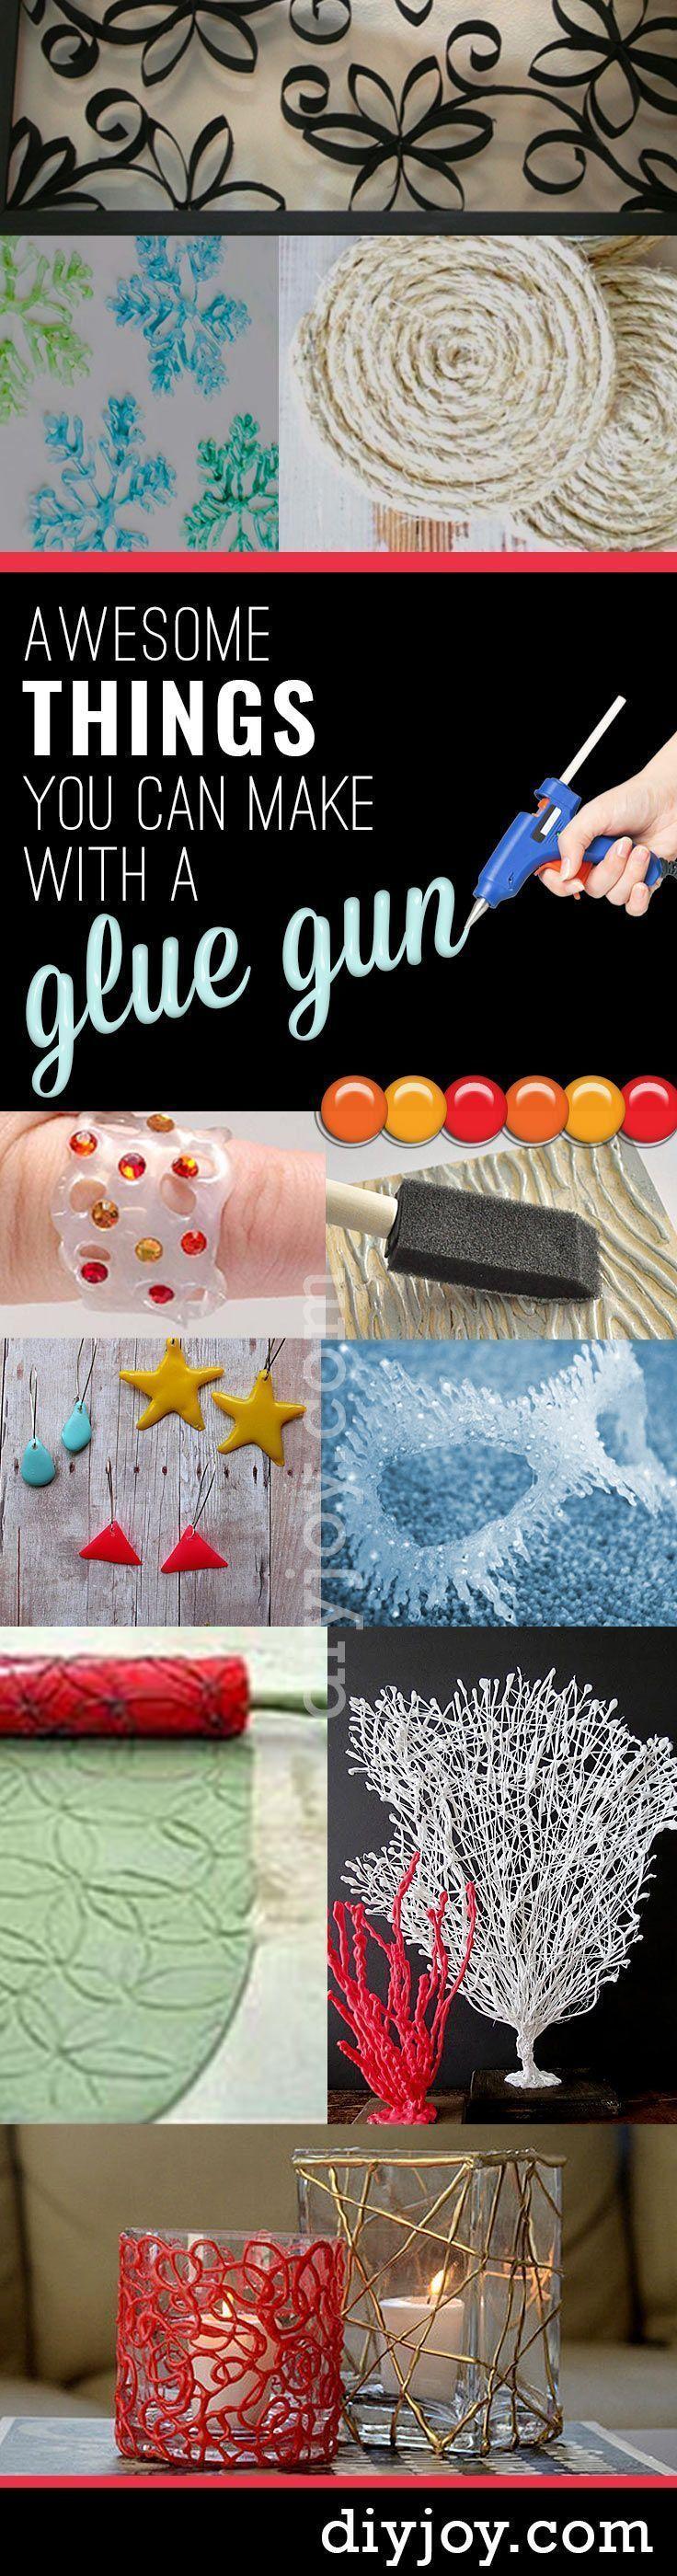 Fun Crafts To Do With A Hot Glue Gun | Best Hot Glue Gun Crafts, DIY Projects and Arts and Crafts Ideas Using Glue Gun Sticks | diyjoy.com/...